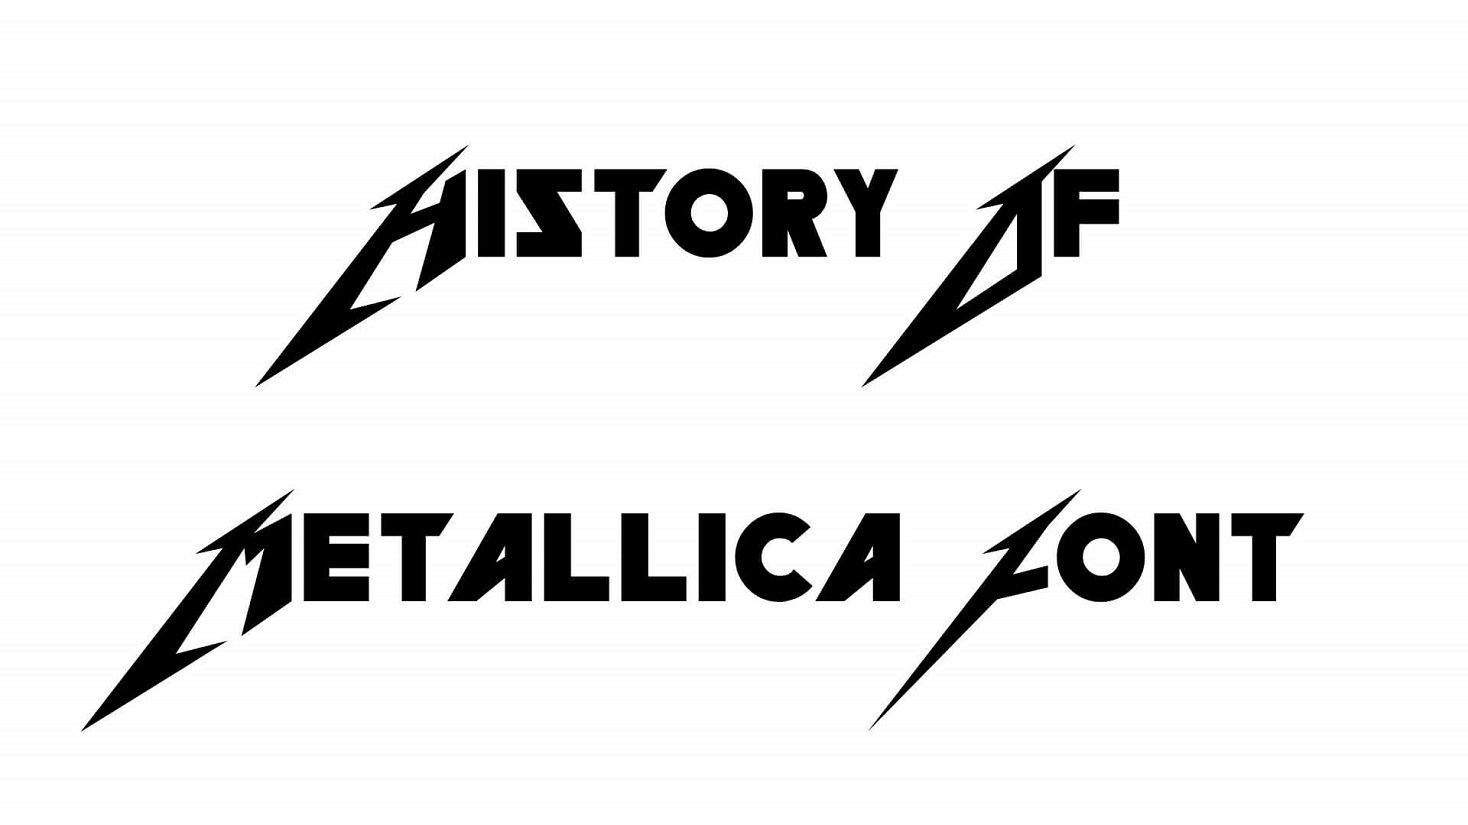 History of Metallica Font